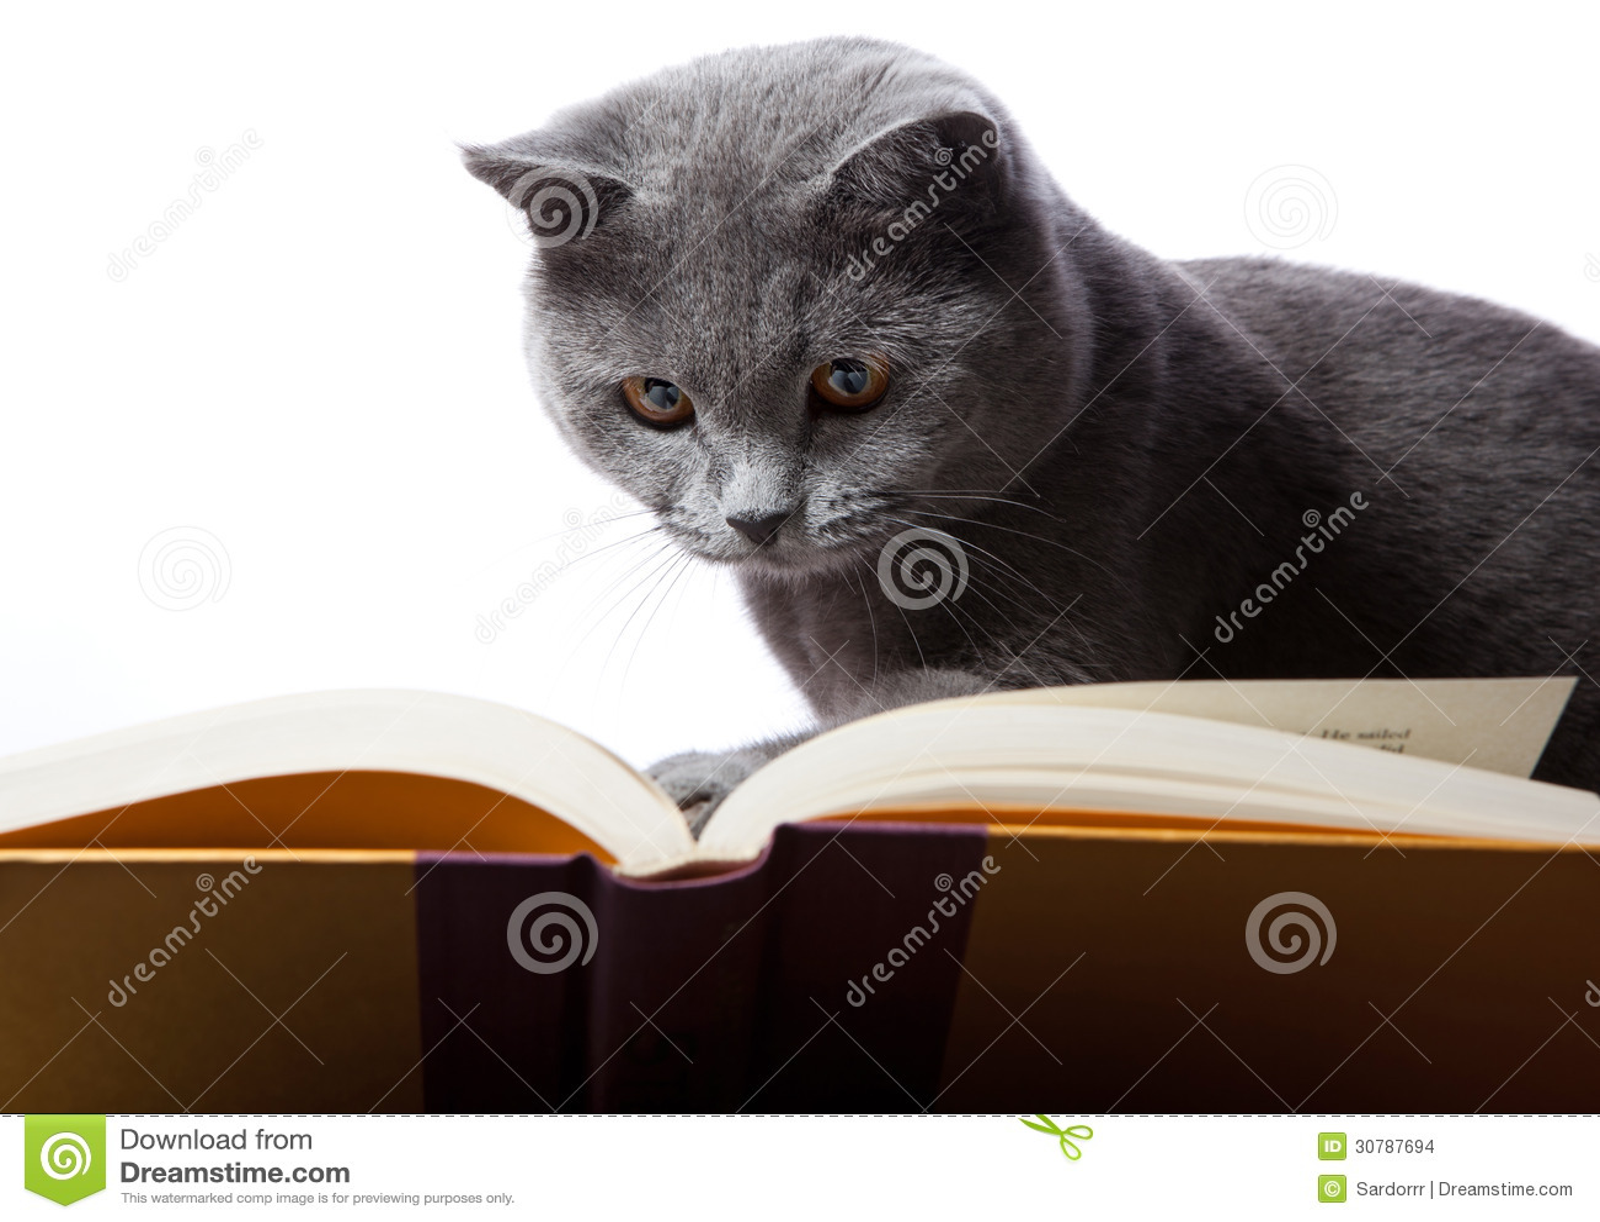 book the guns of normandy a